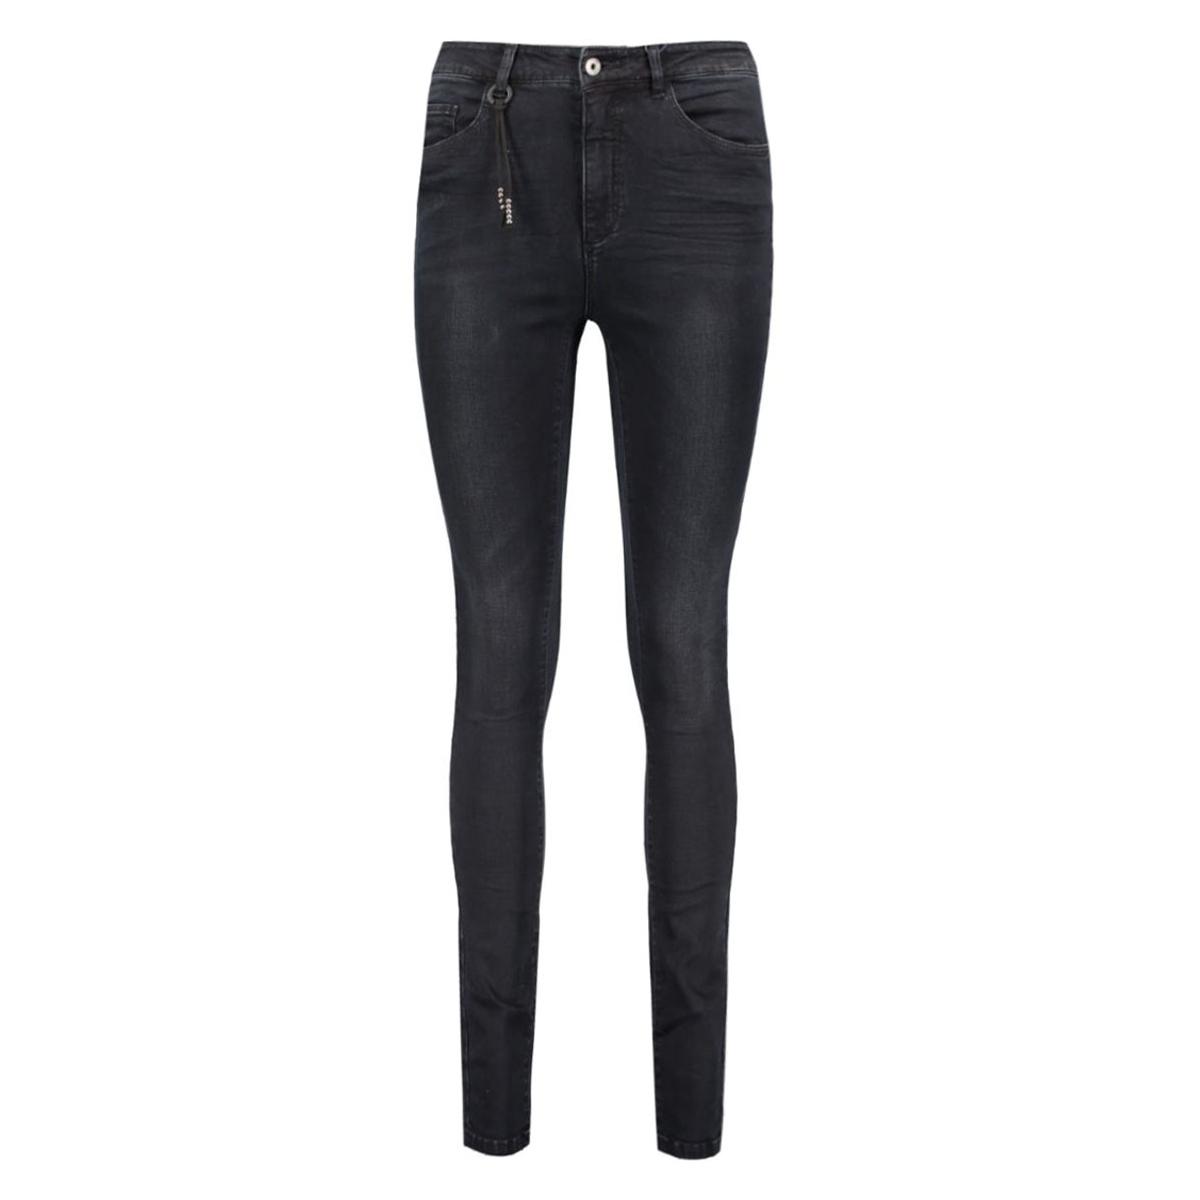 onlpiper hw sk milena dnm jns bj755 15119623 only jeans black